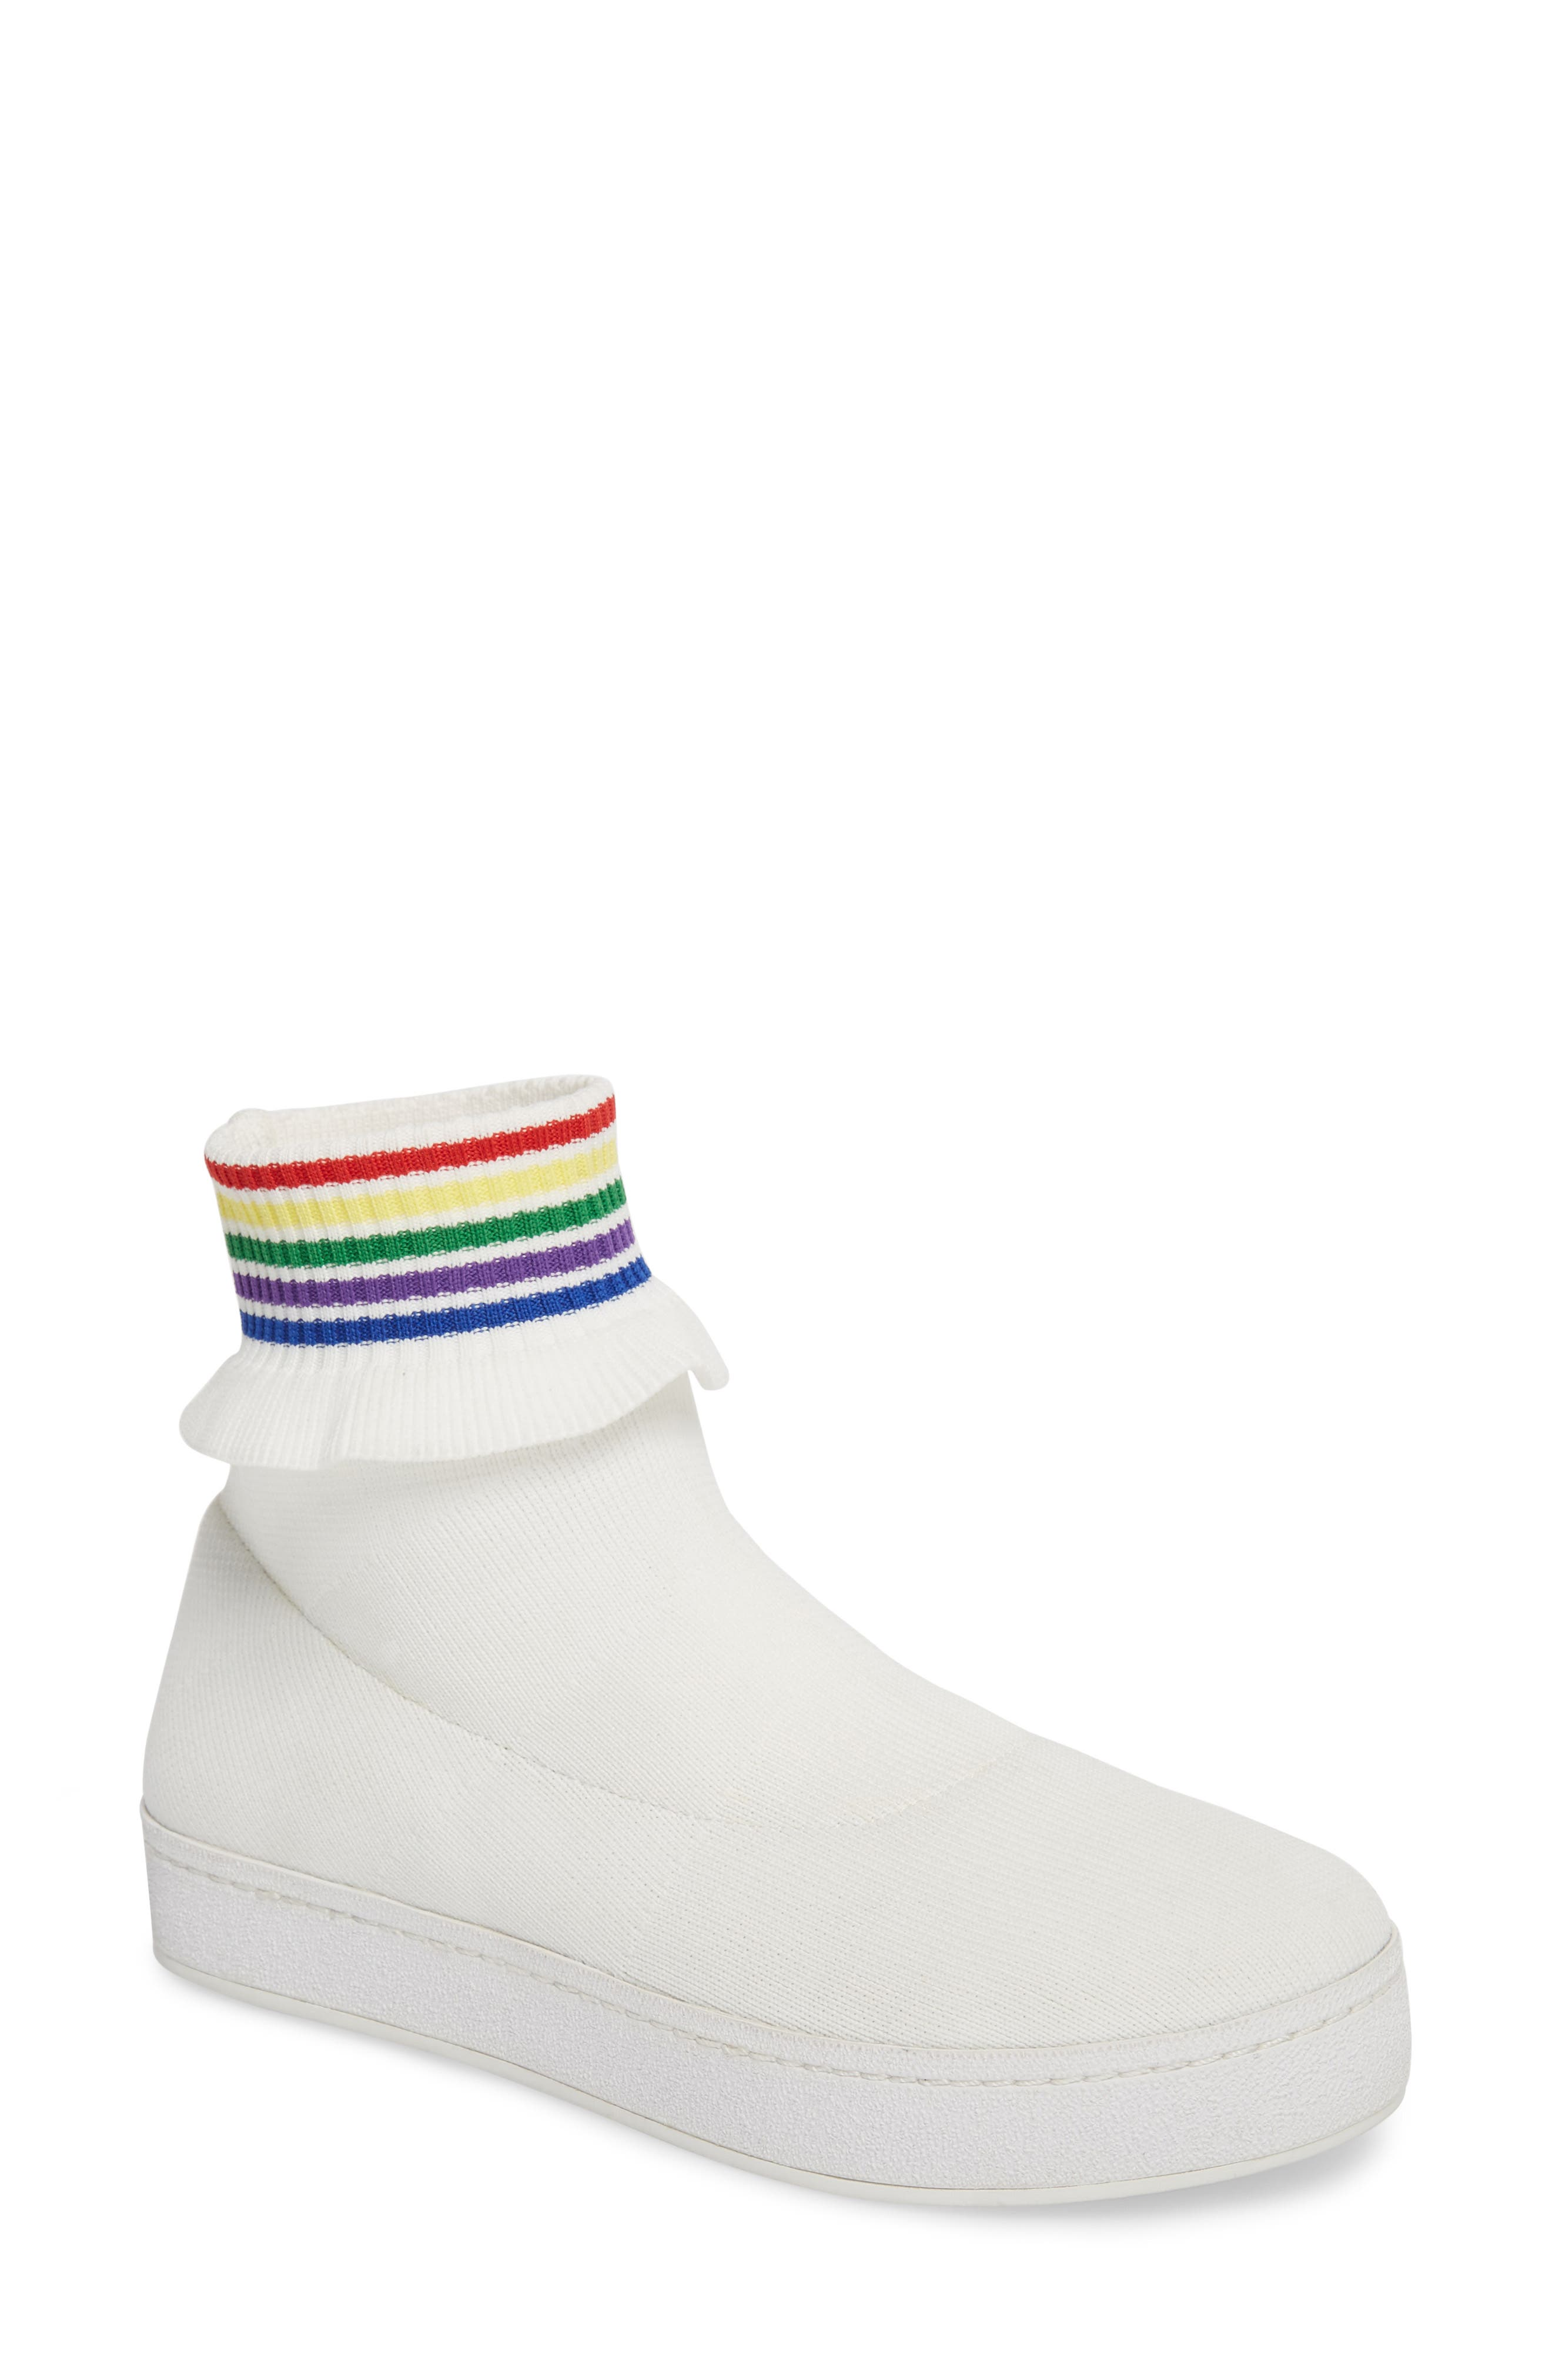 Main Image - Opening Ceremony Bobby Sock Knit Sneaker (Women)